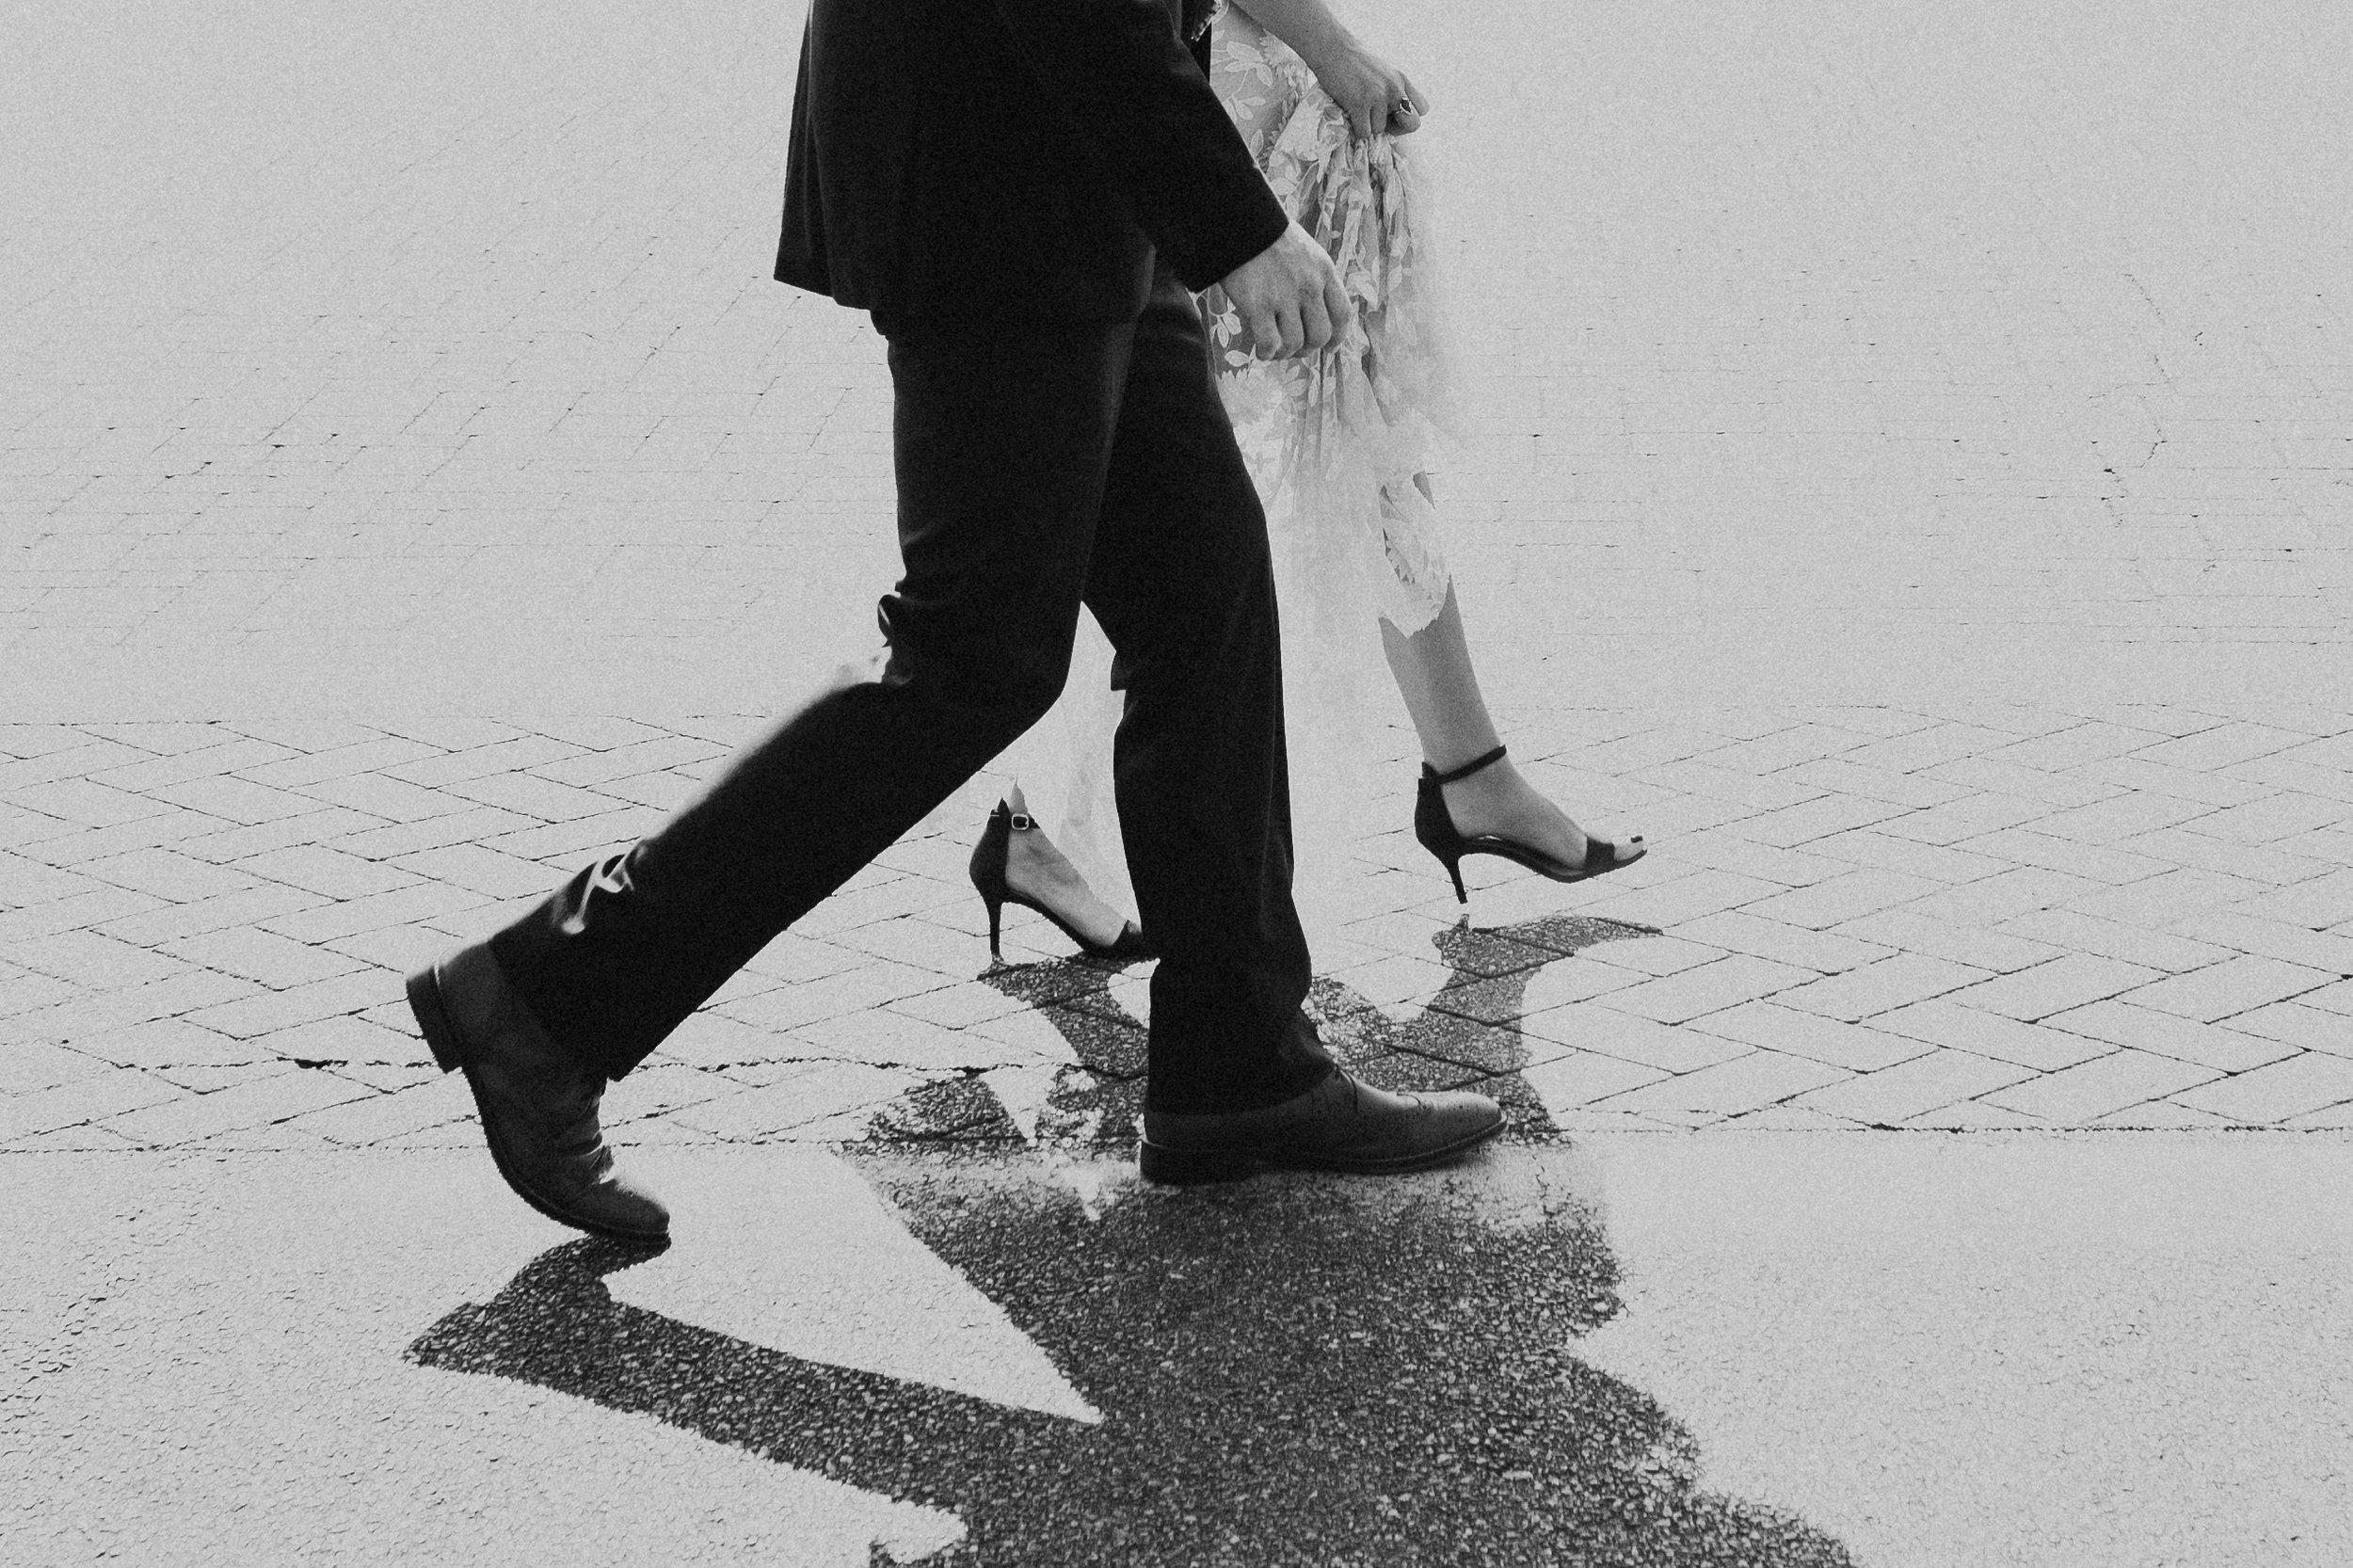 zayda-collin-panama-city-beach-bohemian-hippie-wedding-photography-lisa-frank-inspired-bride-groom-portraits-first-look-141.jpg